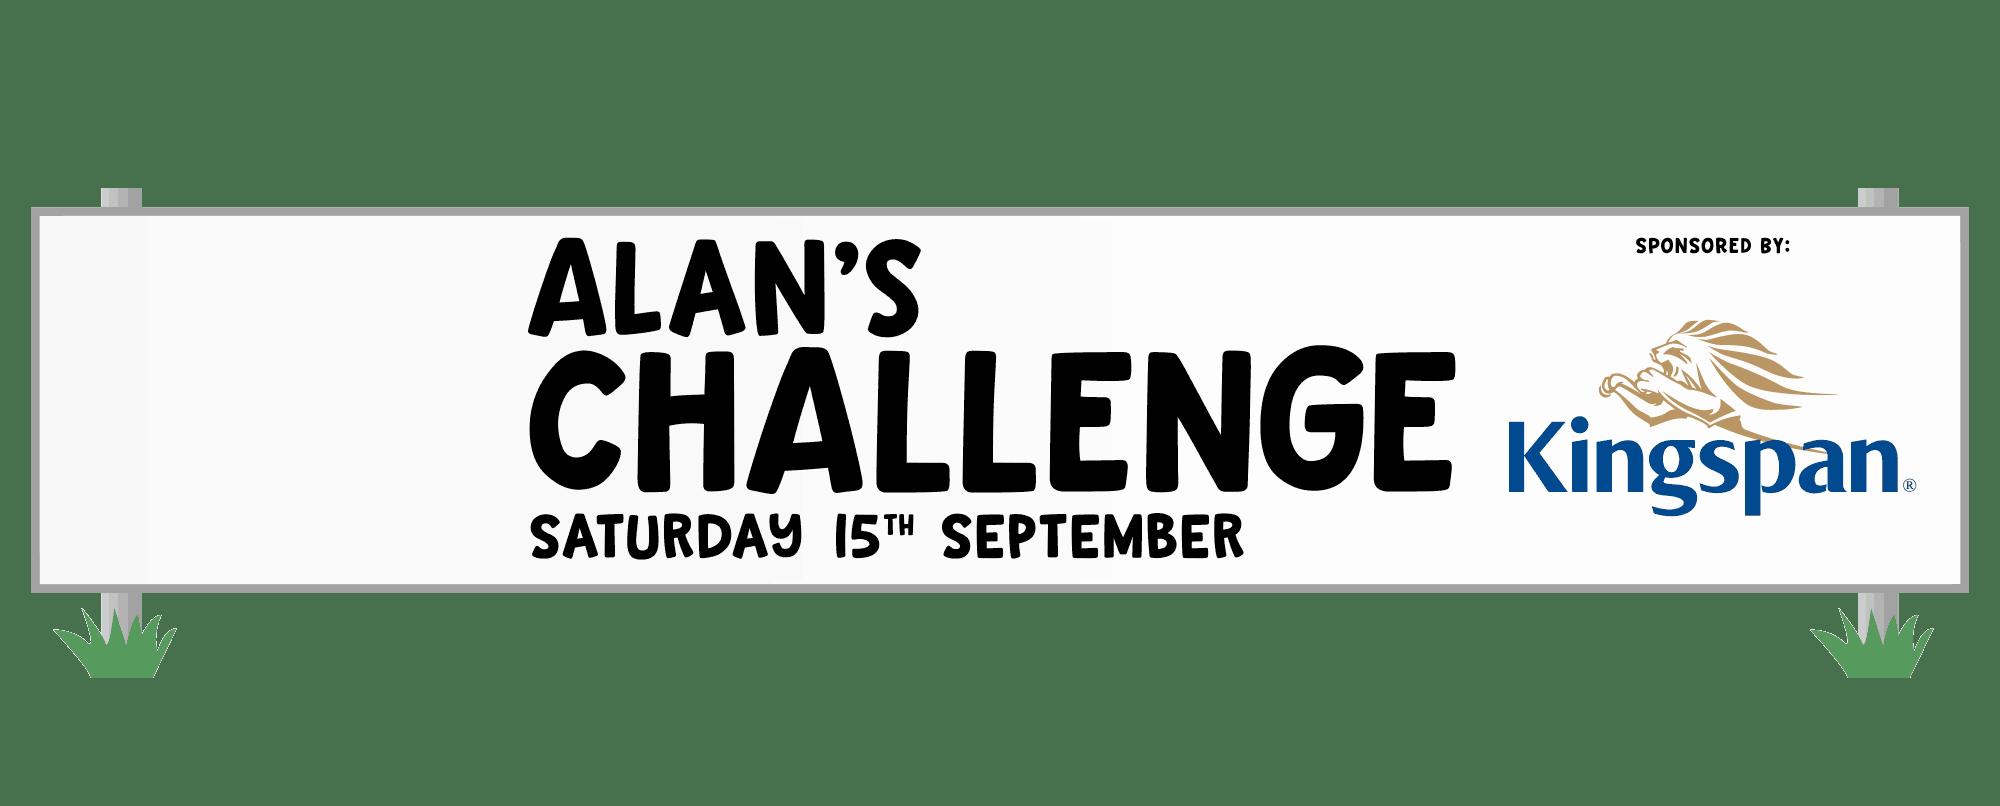 Alans Challenge Sponsored by Kingspan Logo